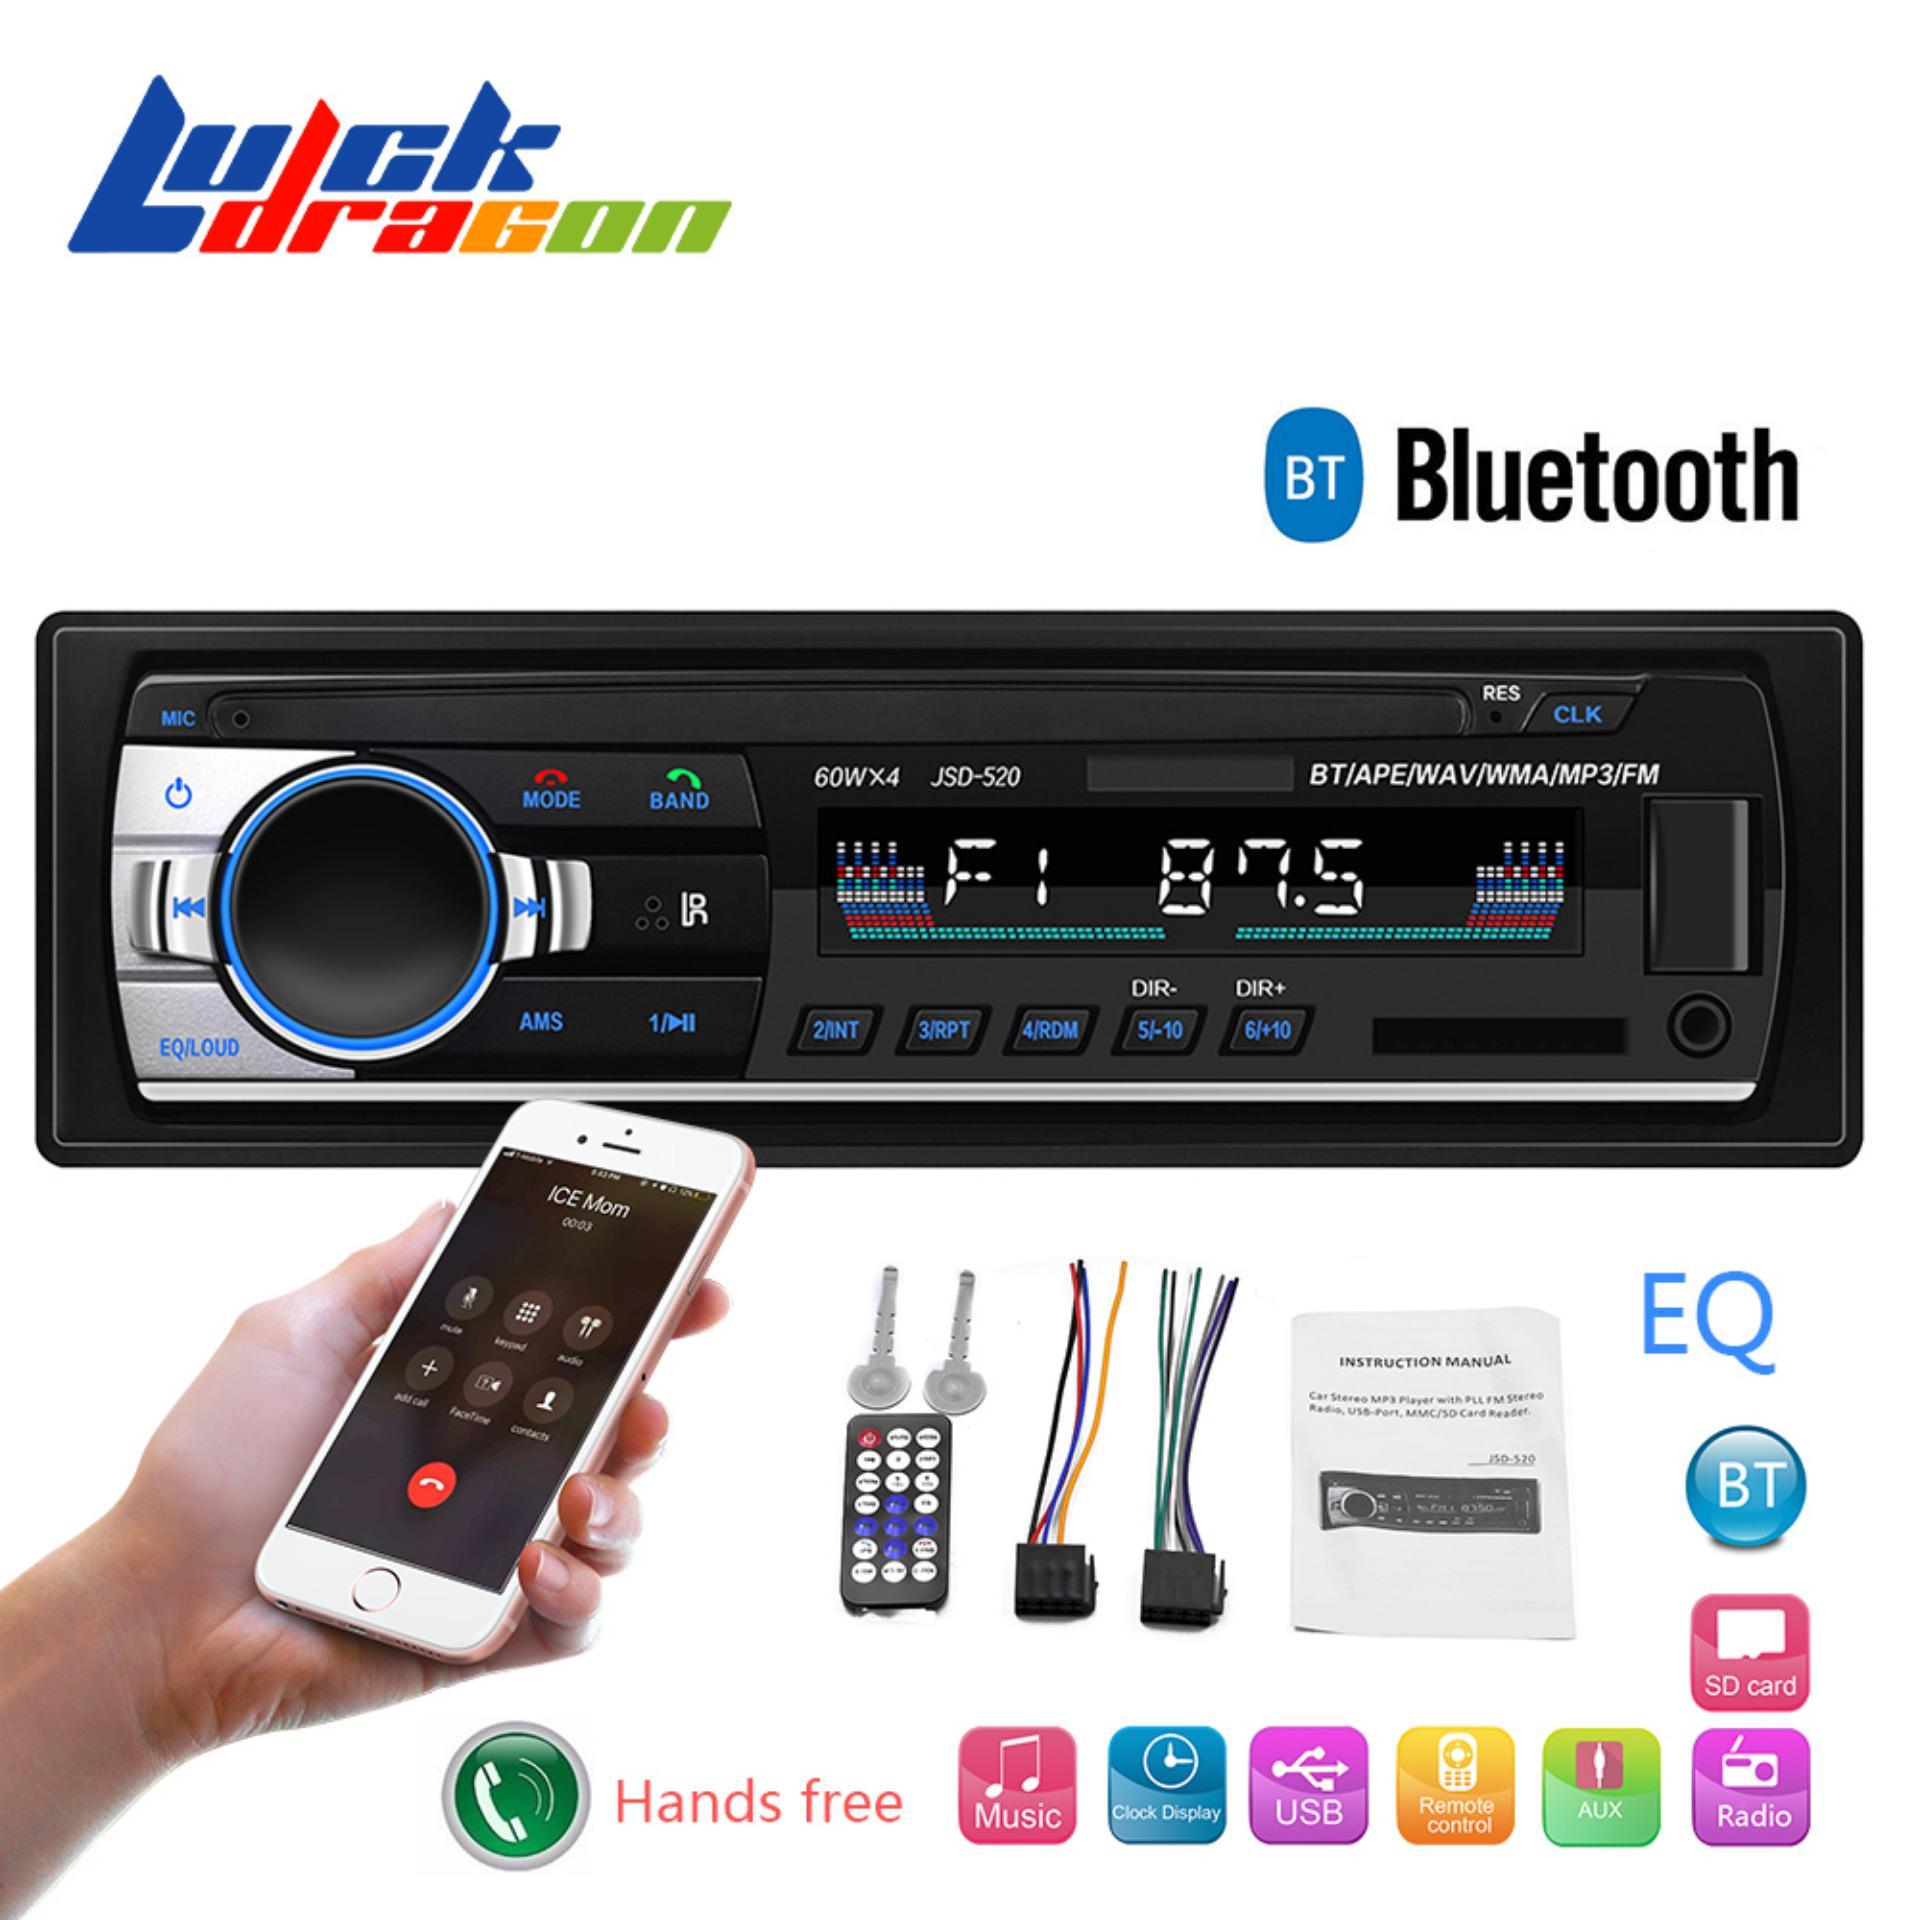 7d644a754e2 jsd-520 12V Bluetooth Car Stereo FM Radio MP3 Audio Player 5V Charger USB